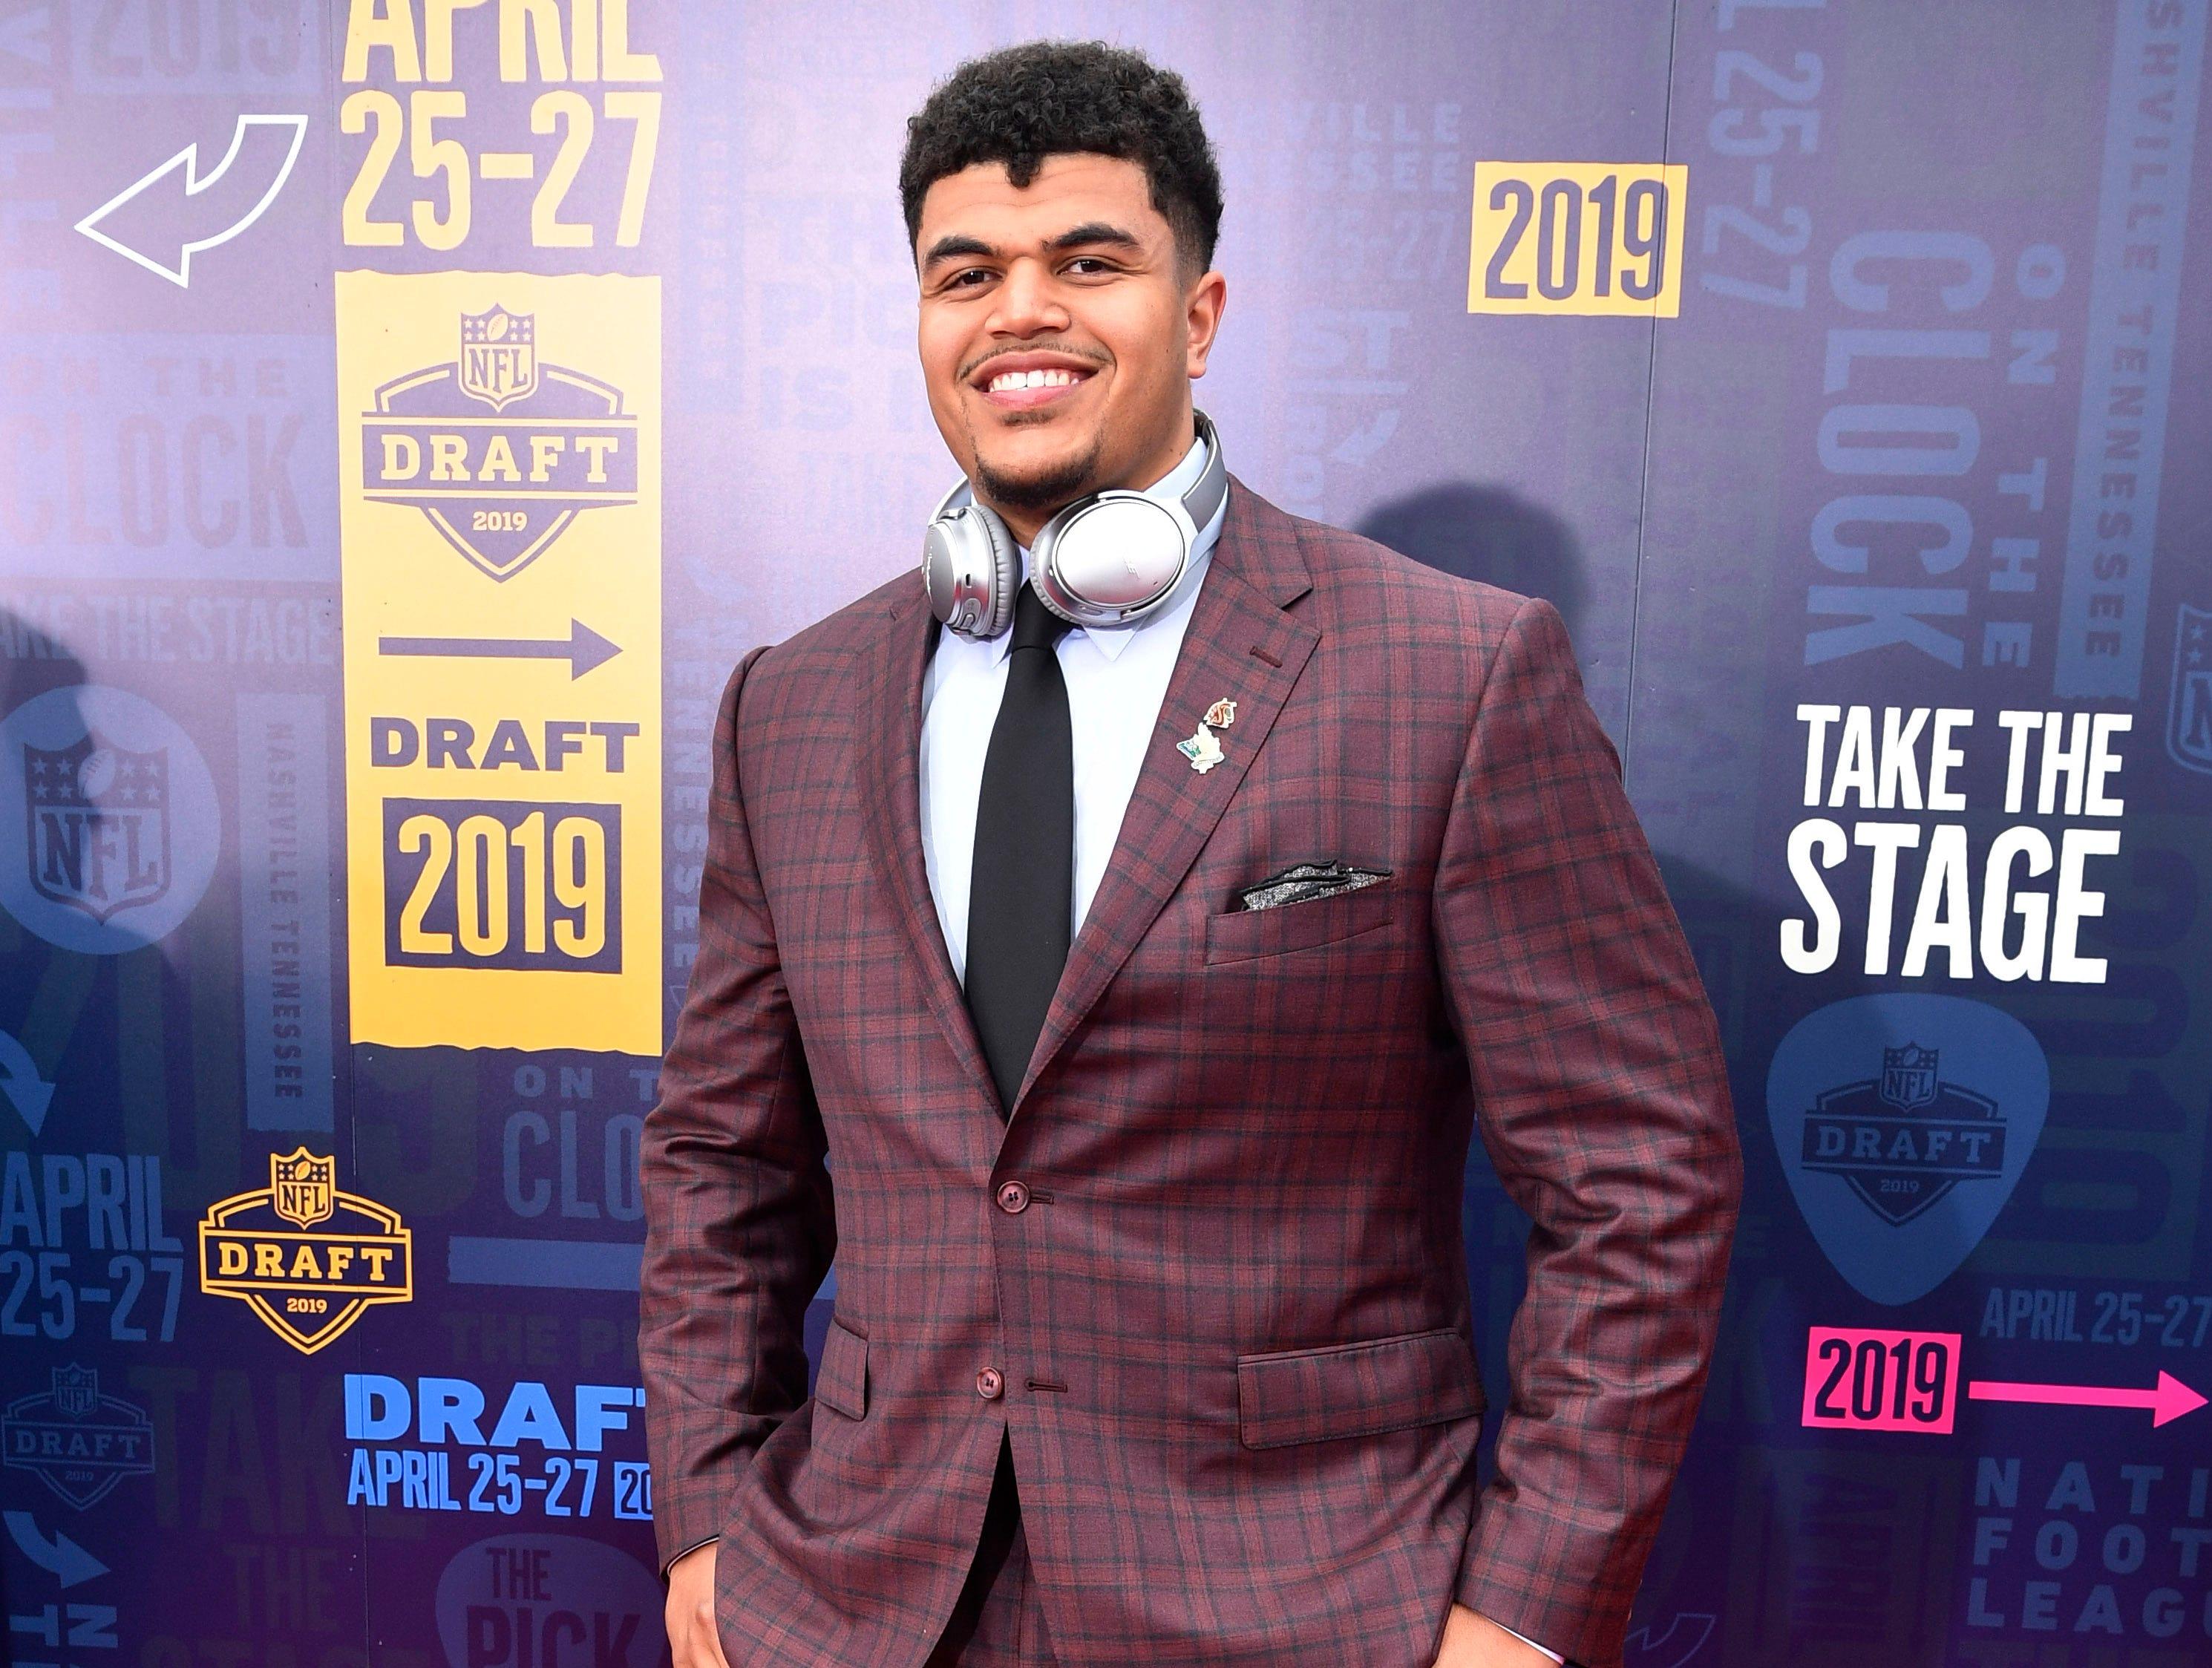 Philadelphia Eagles draft picks 2019: Round-by-round selections